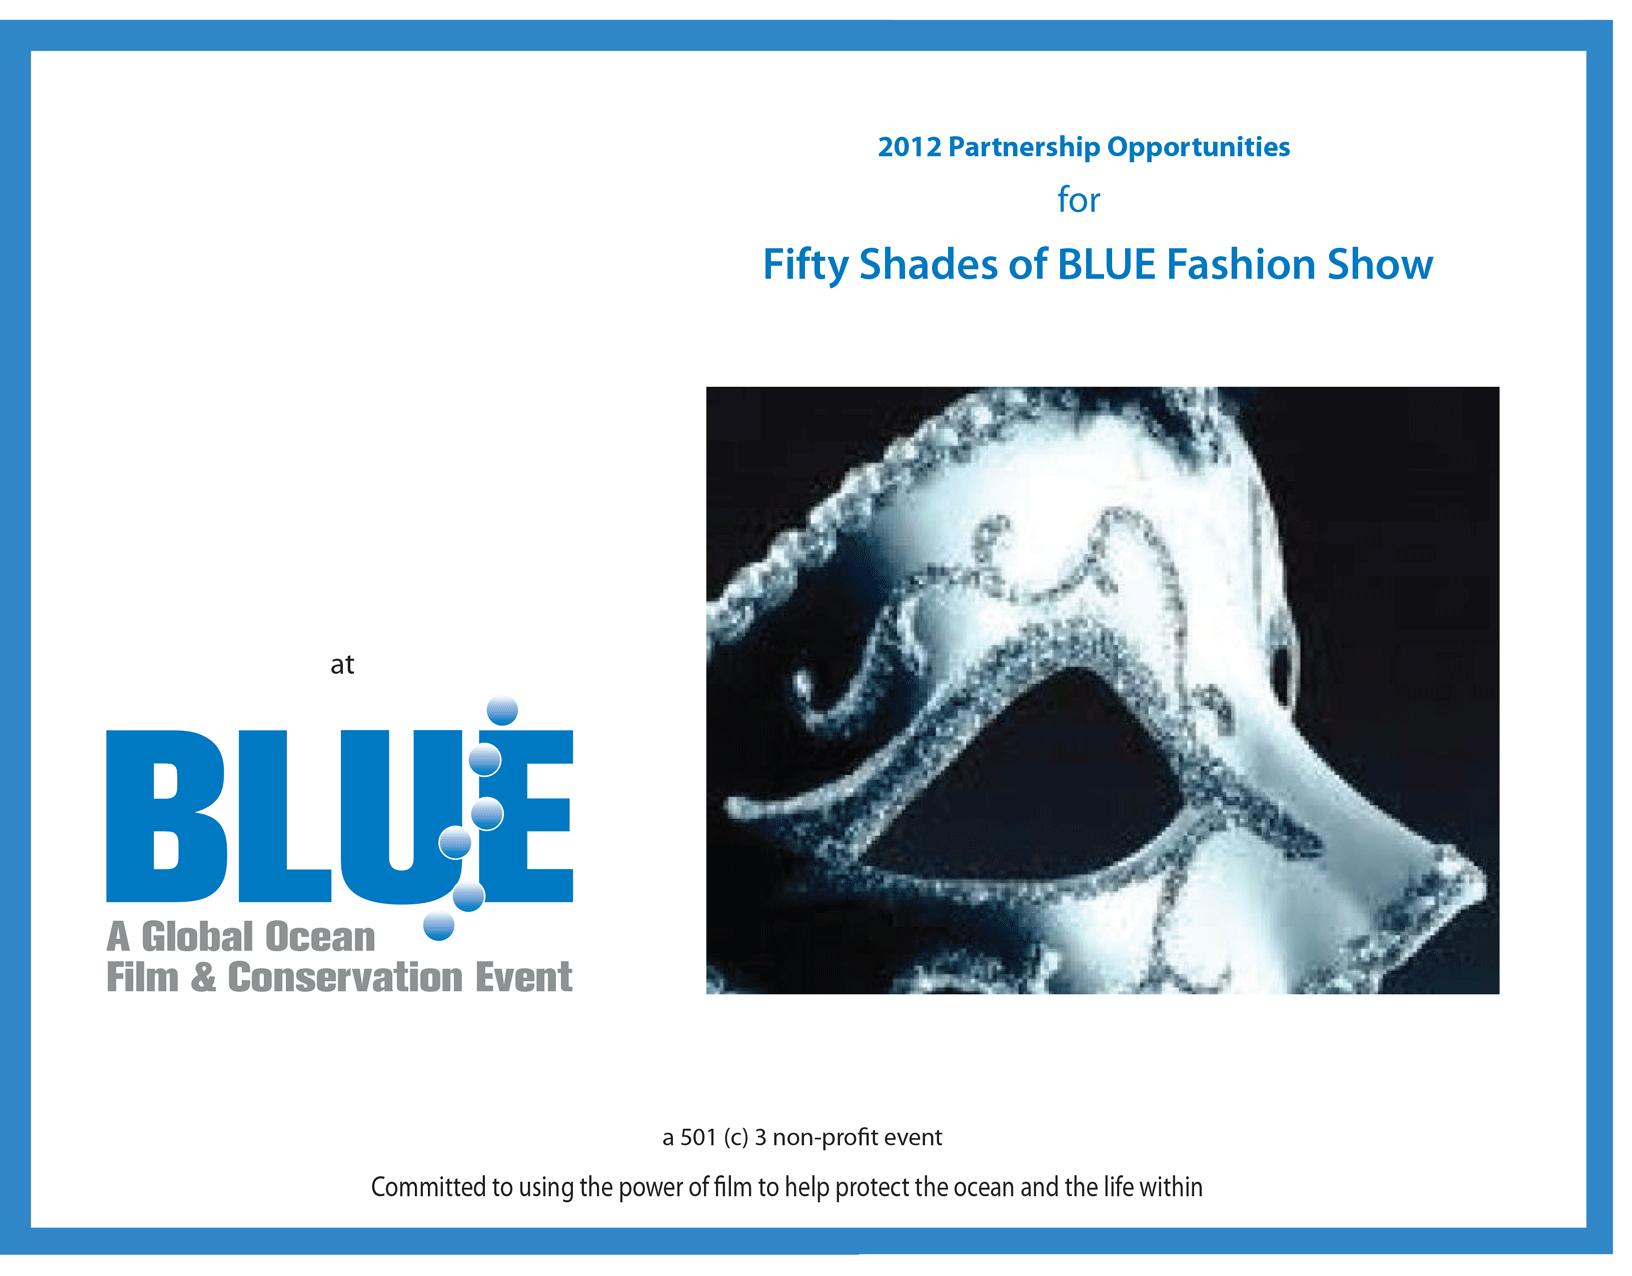 50-Shades-of-BLUE-Fashion-Show-1-1